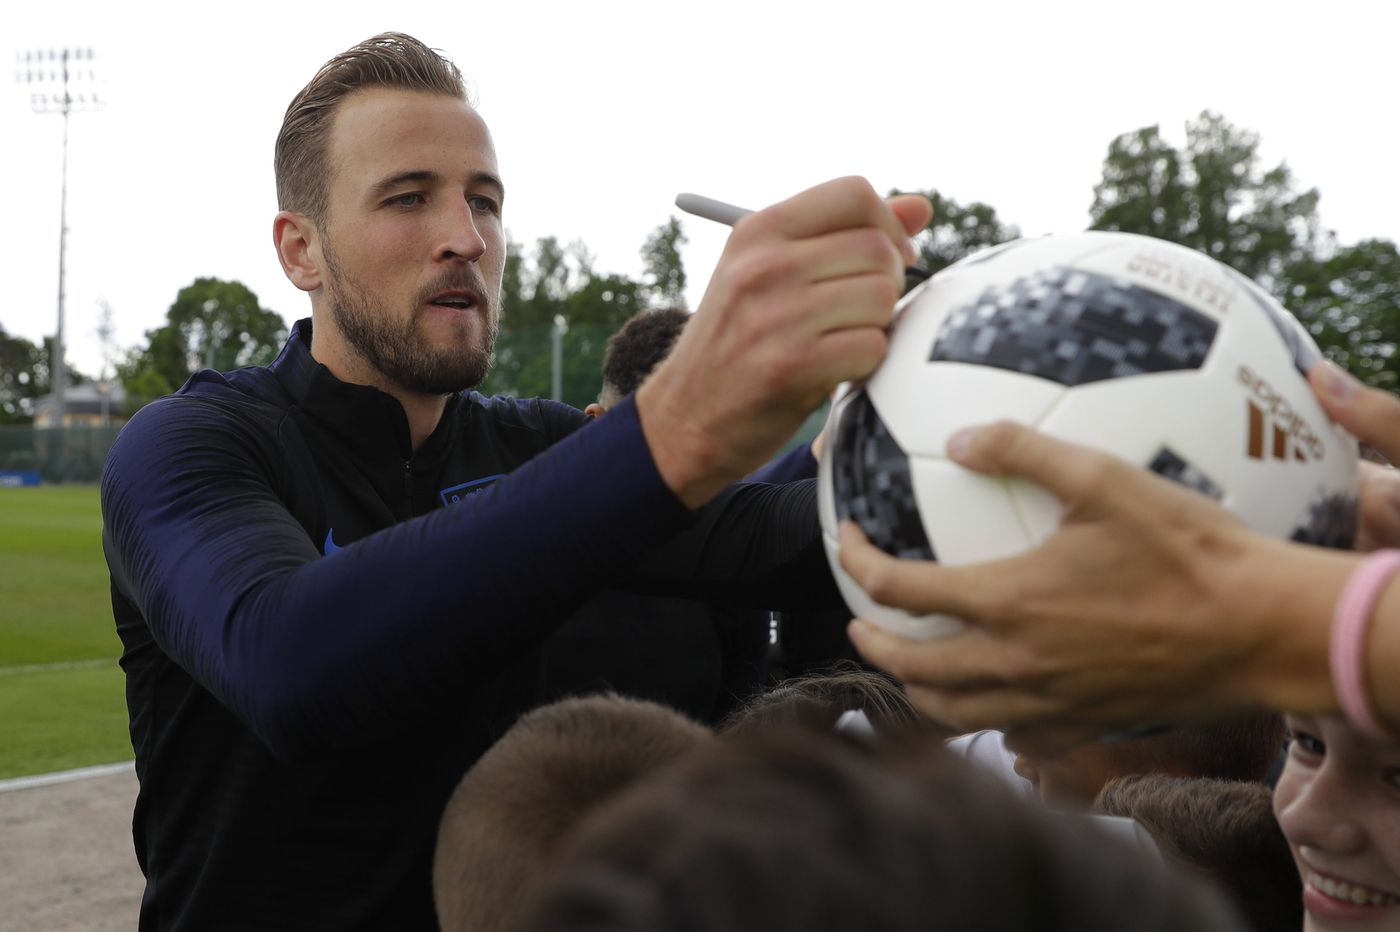 World Cup schedule: Belgium, England start race to win group in June 18 games